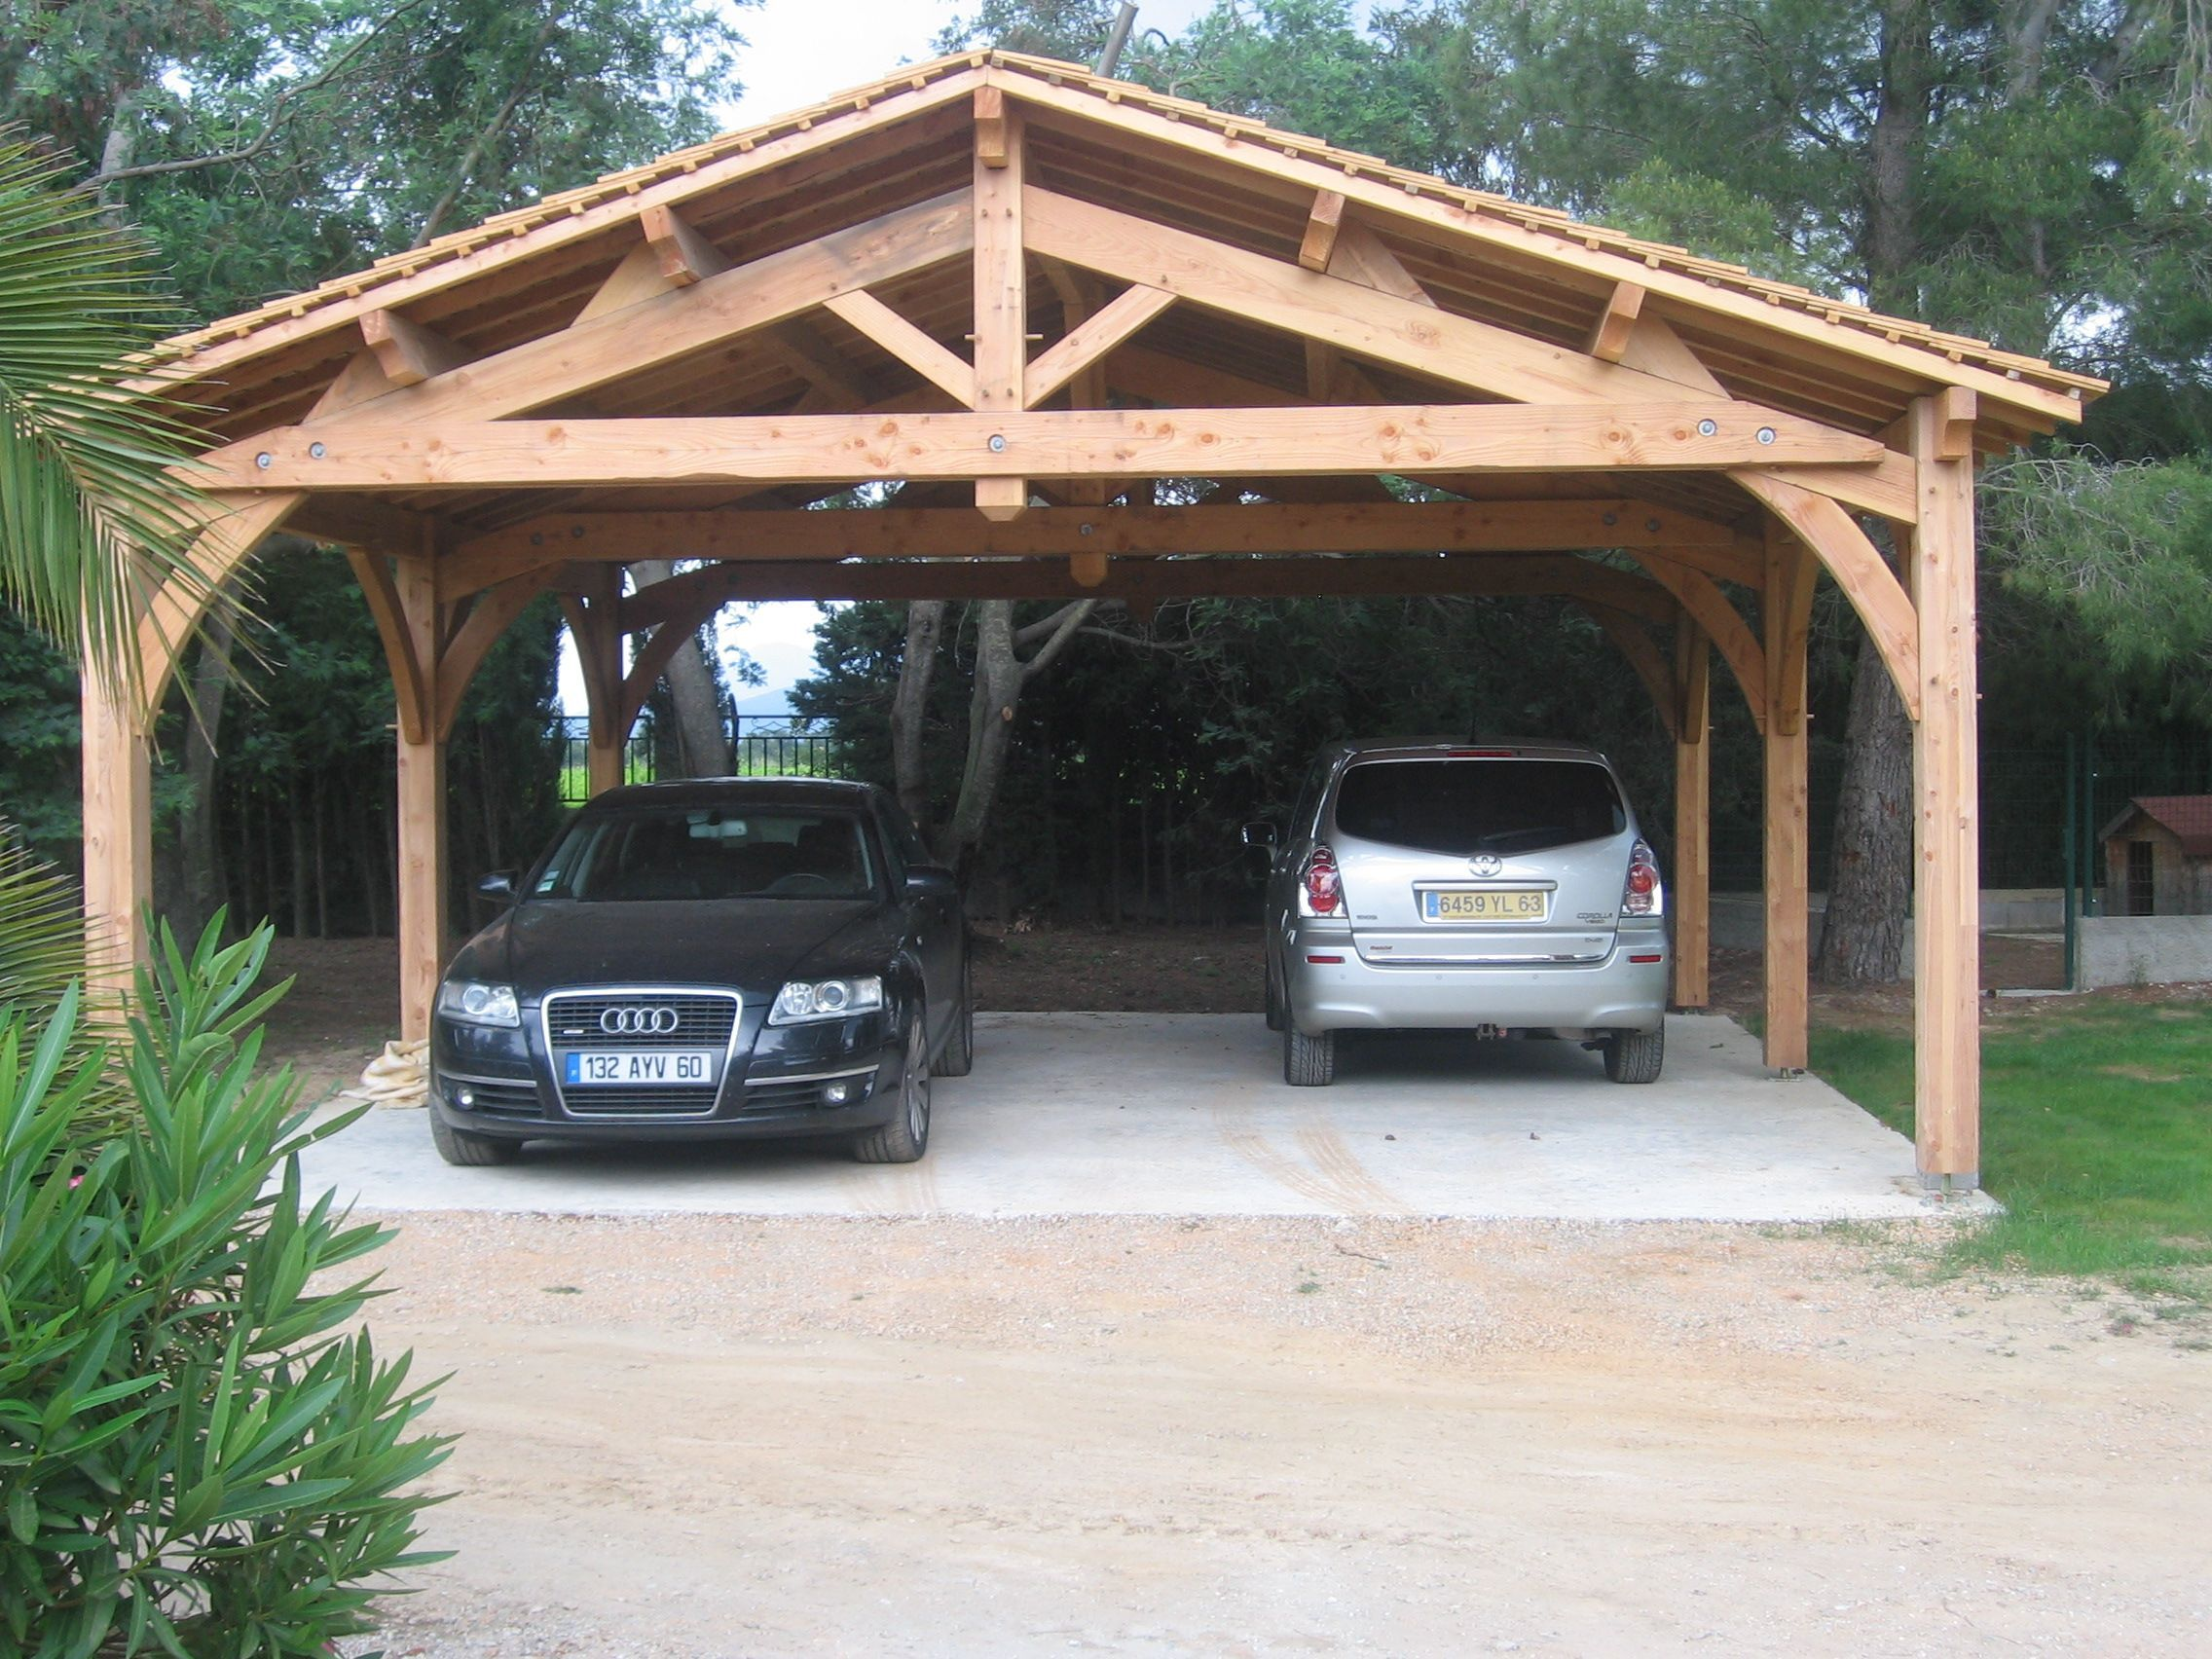 50 Carports Designs For Minimalist Homes Carport Designs Wooden Carports Carport Garage